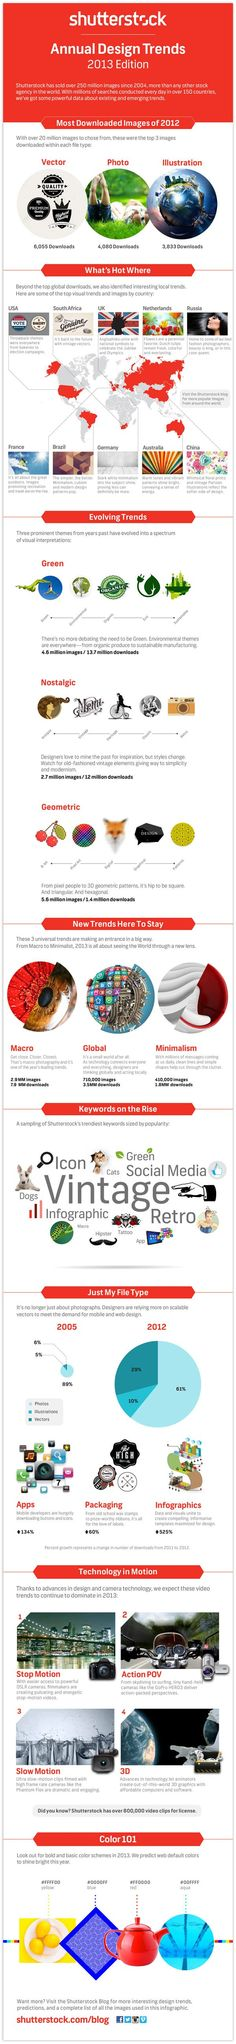 Annual design trends 2013 #infografia #infographic #design